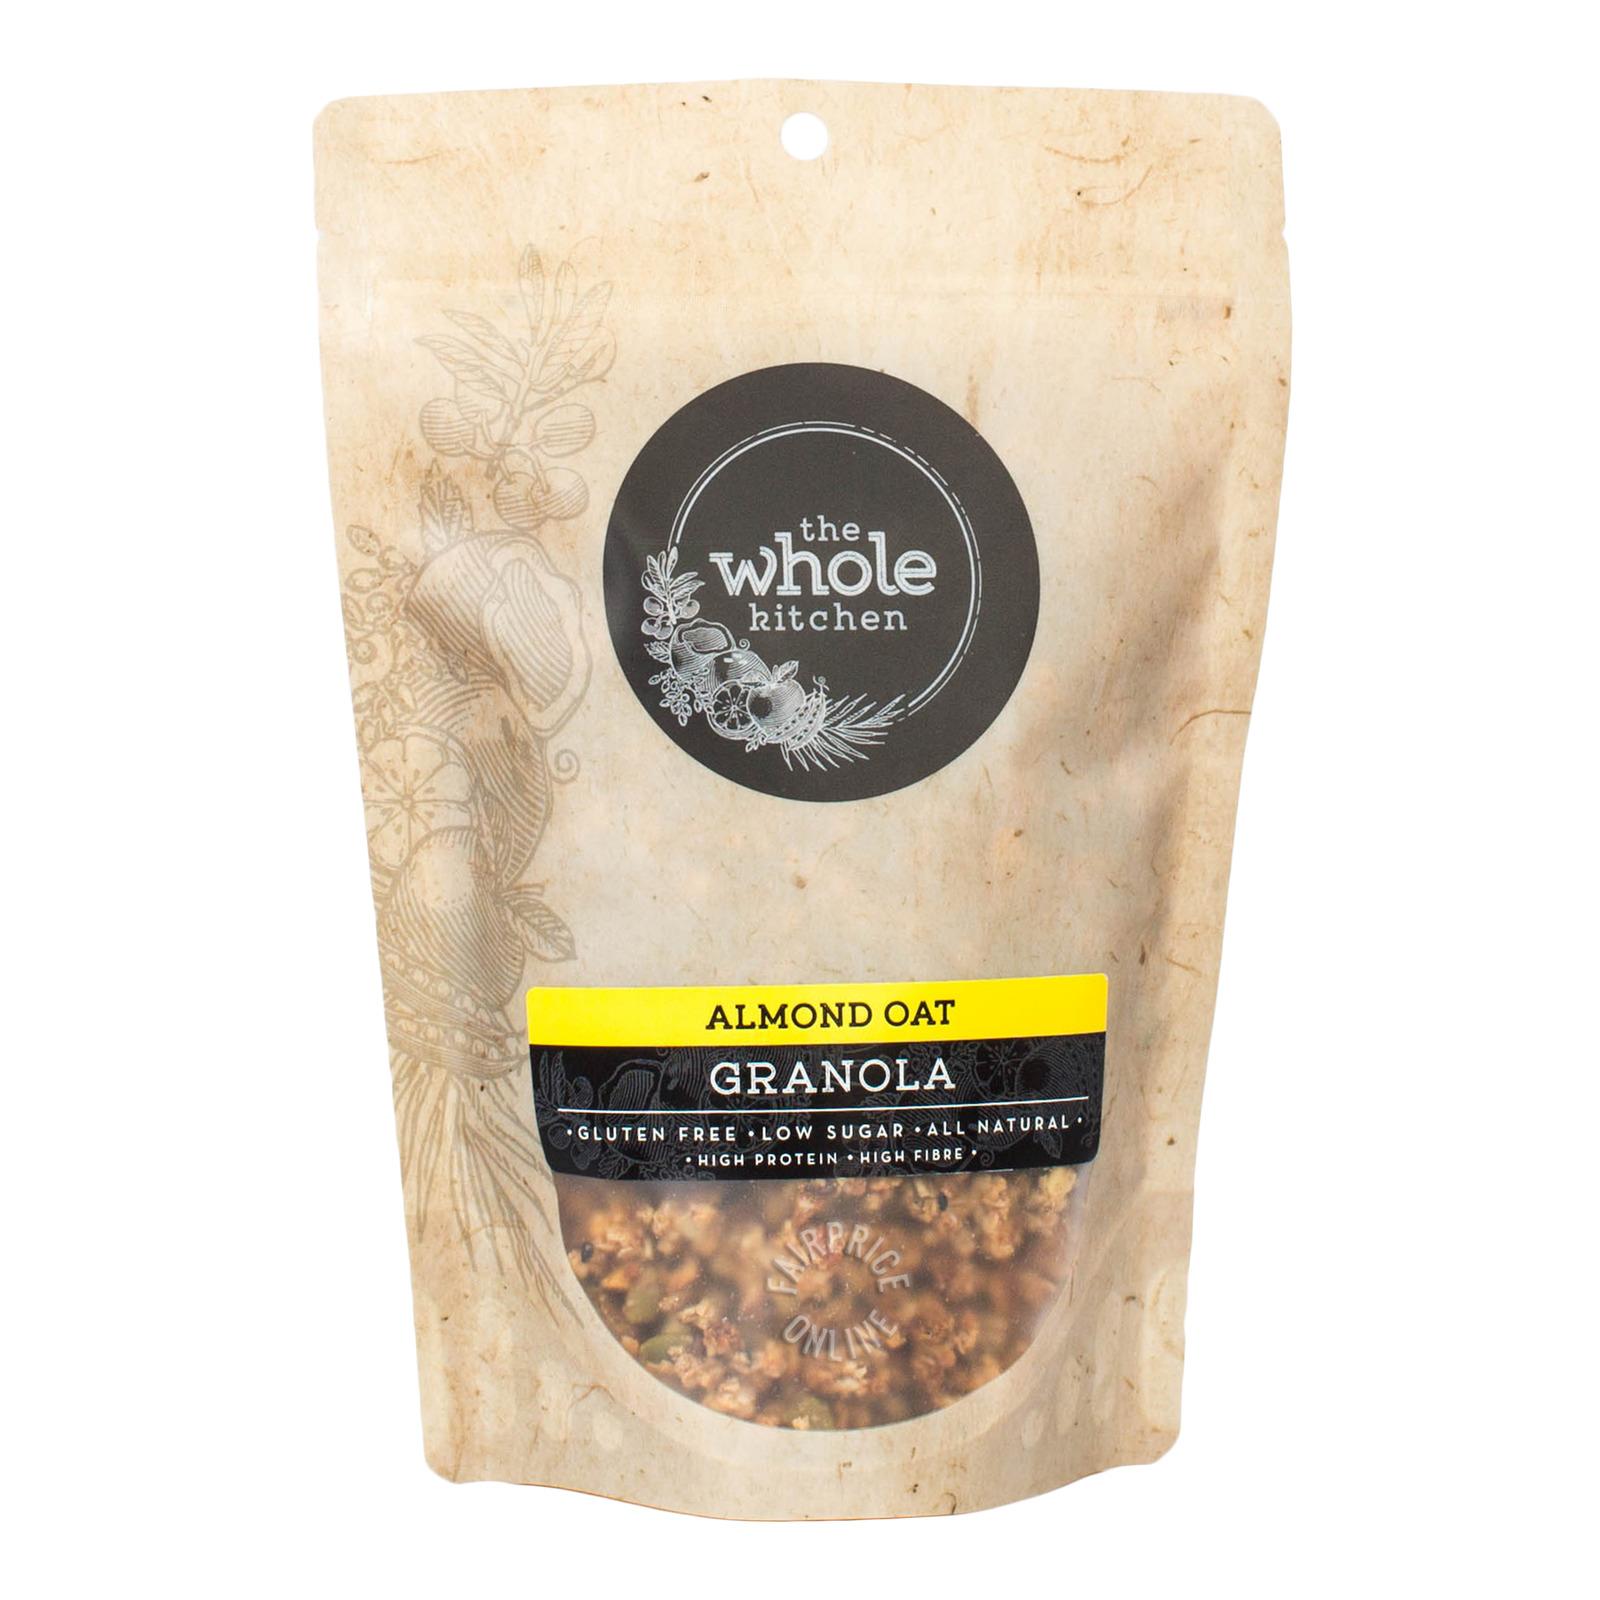 The Whole Kitchen Gluten Free Granola - Almond Oat